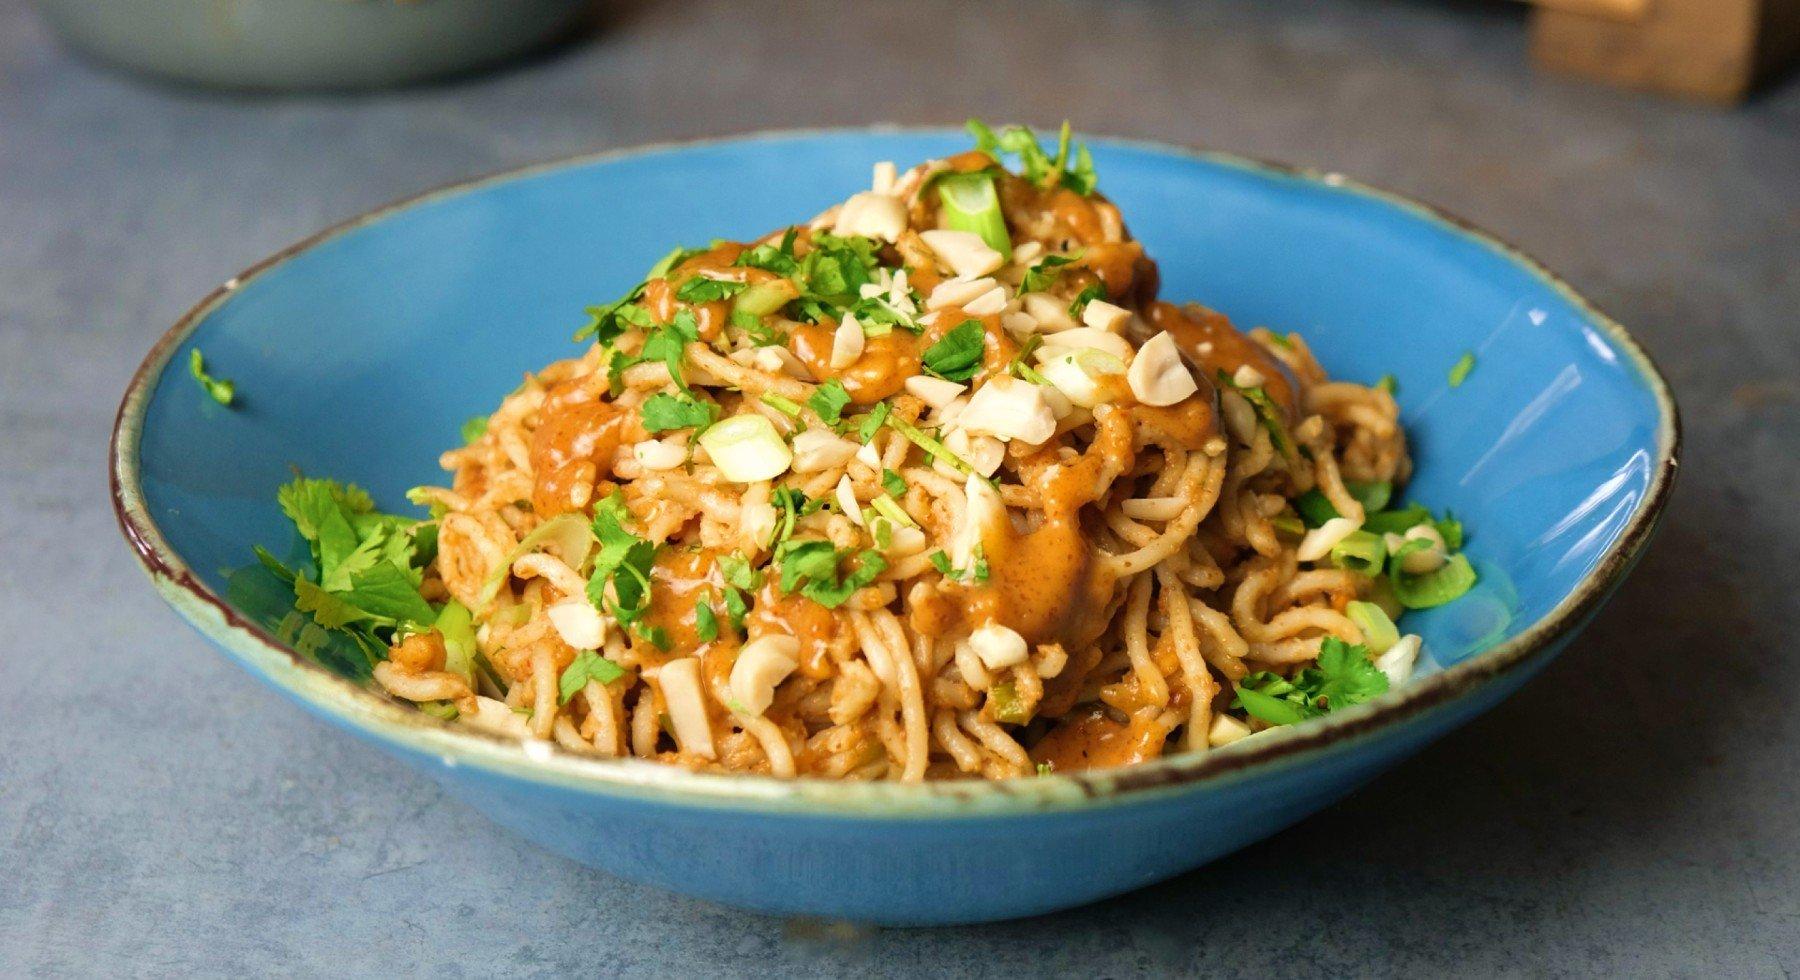 Cremige Erdnussbutter-Pasta | Veganes Rezept - Fertig in 15 Minuten